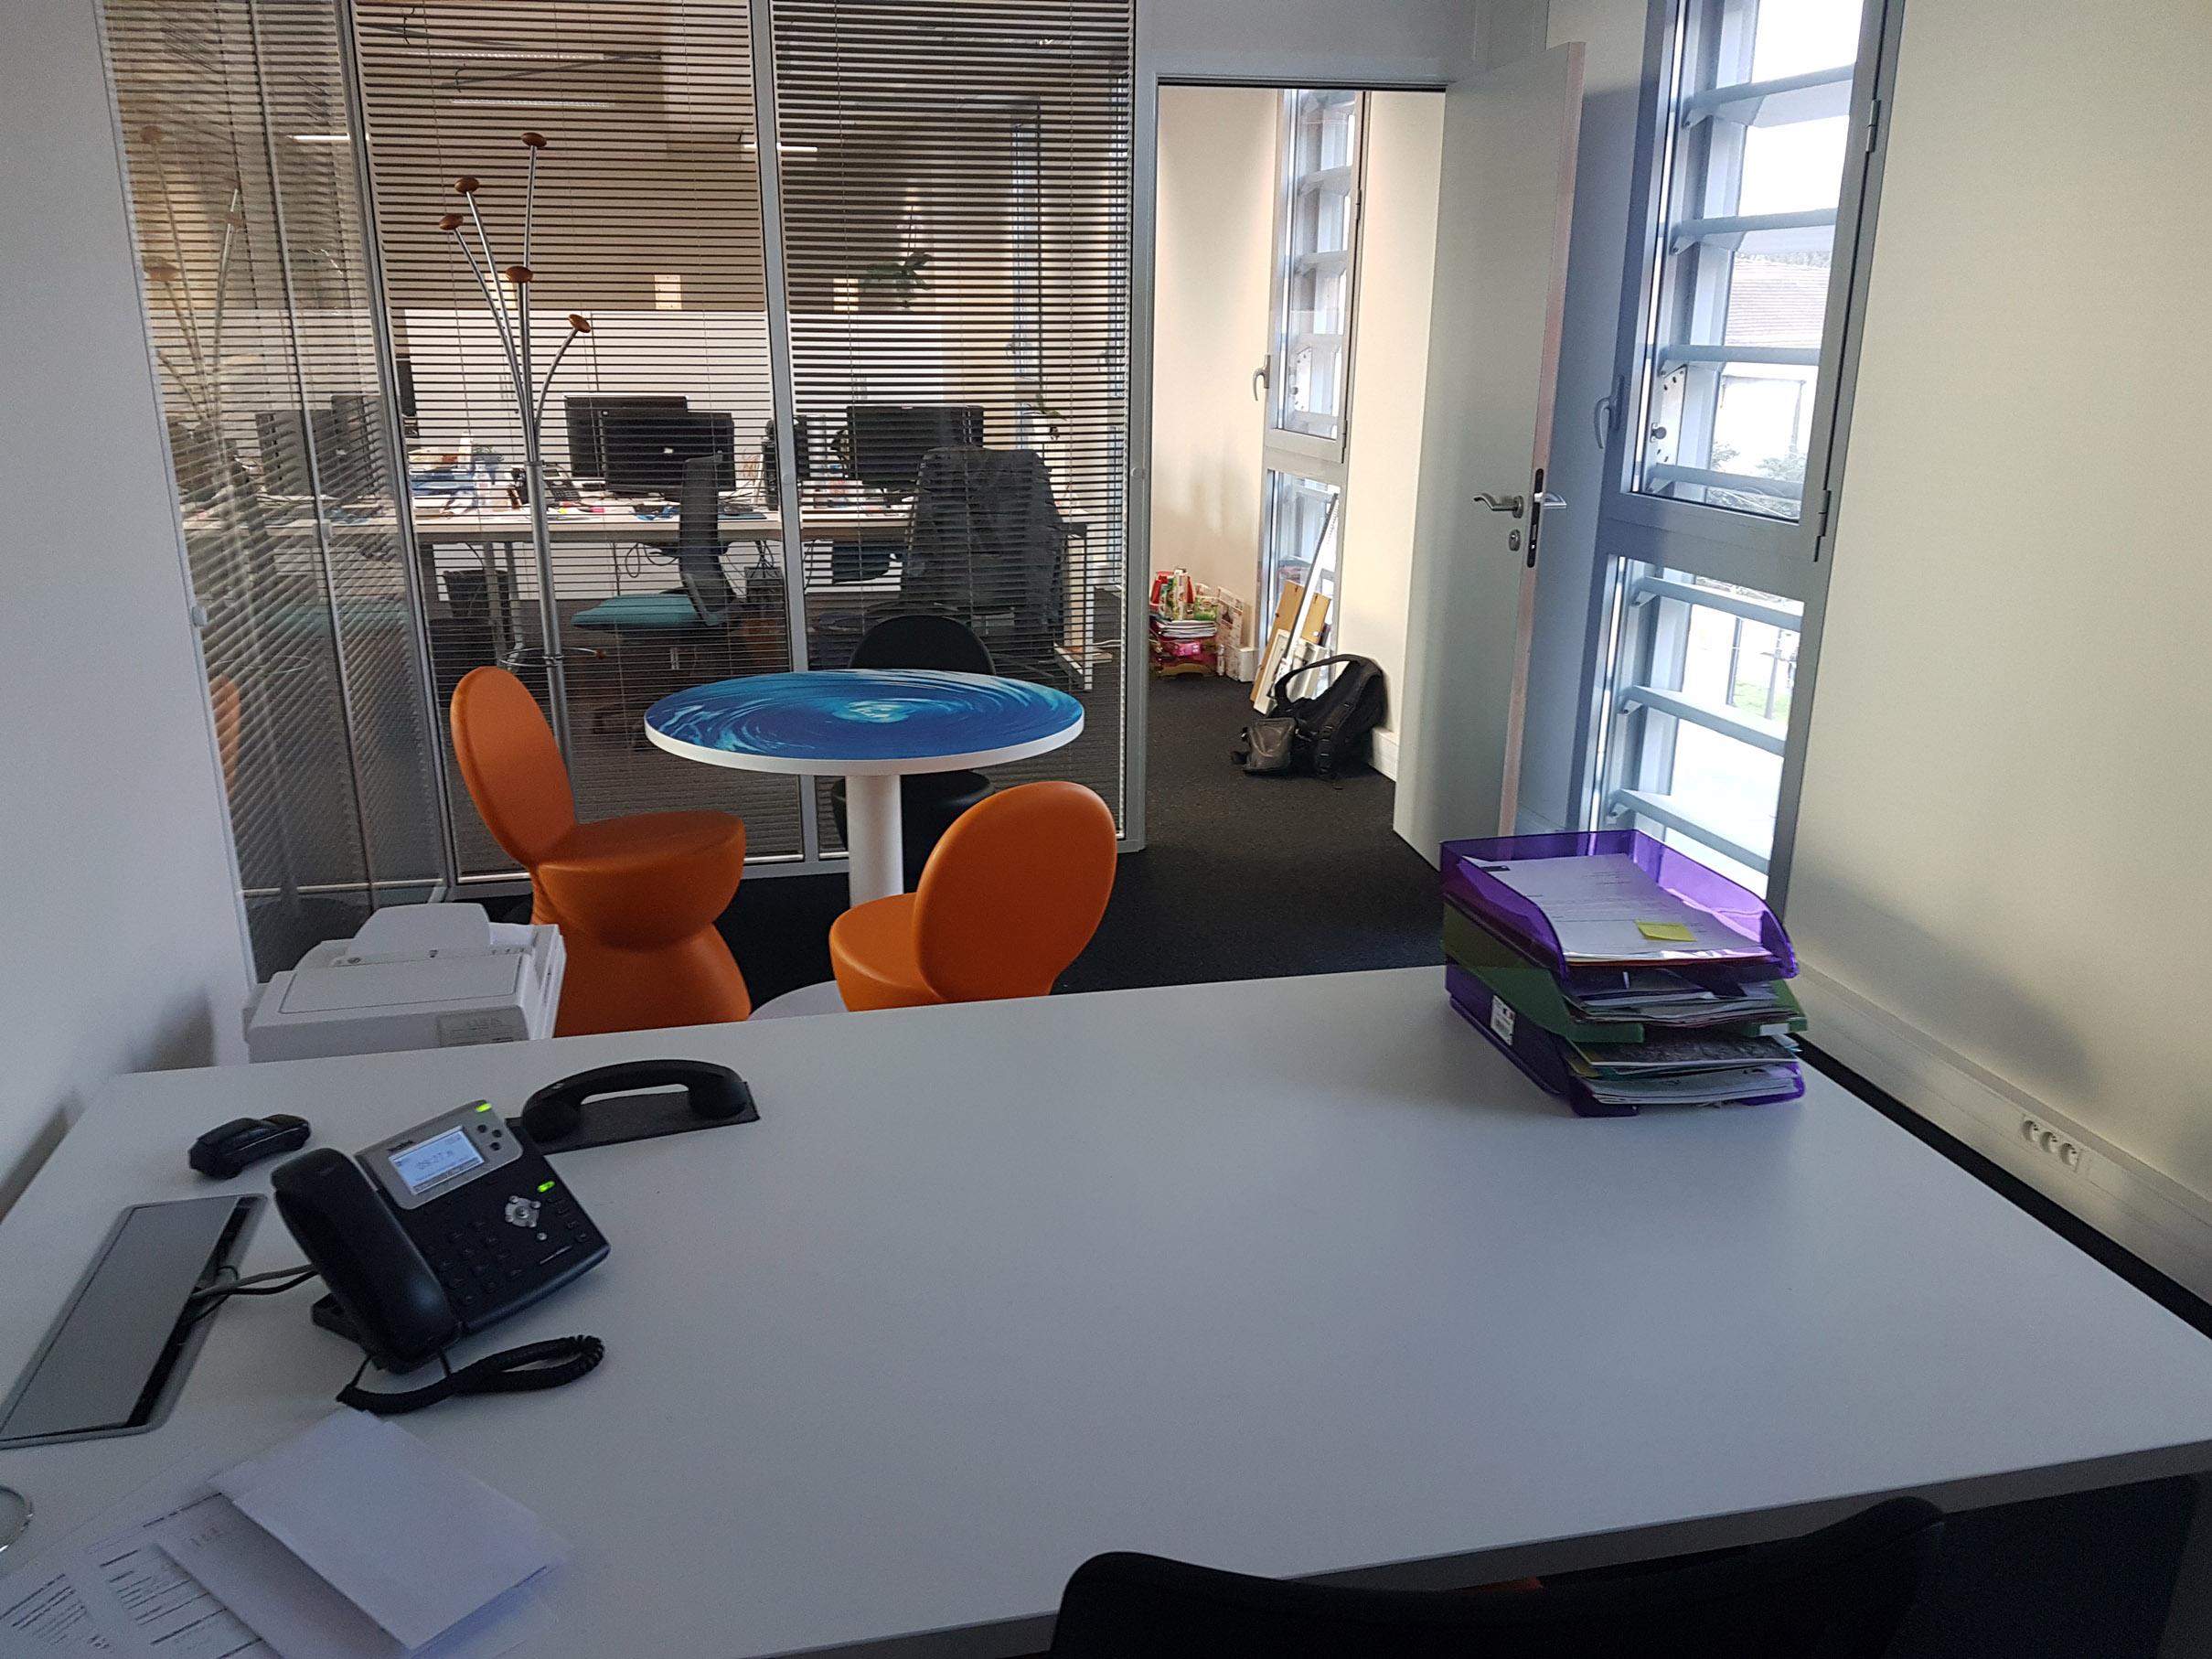 Location bureaux lyon 9 69009 36m² u2013 bureauxlocaux.com